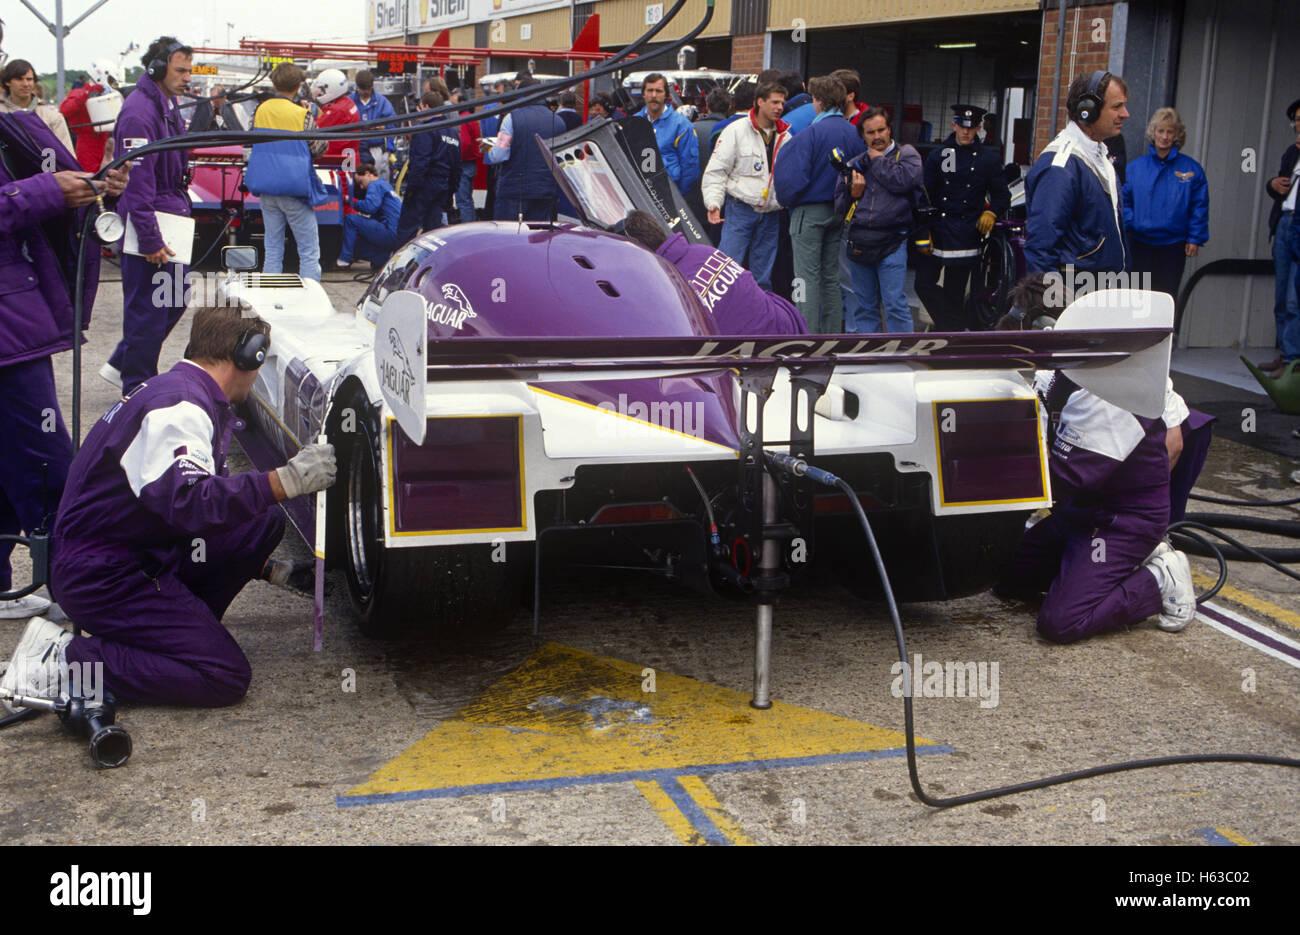 Silk Cut Jaguar XJR-9 pit stop 1989 Stock Photo: 124235778 ...